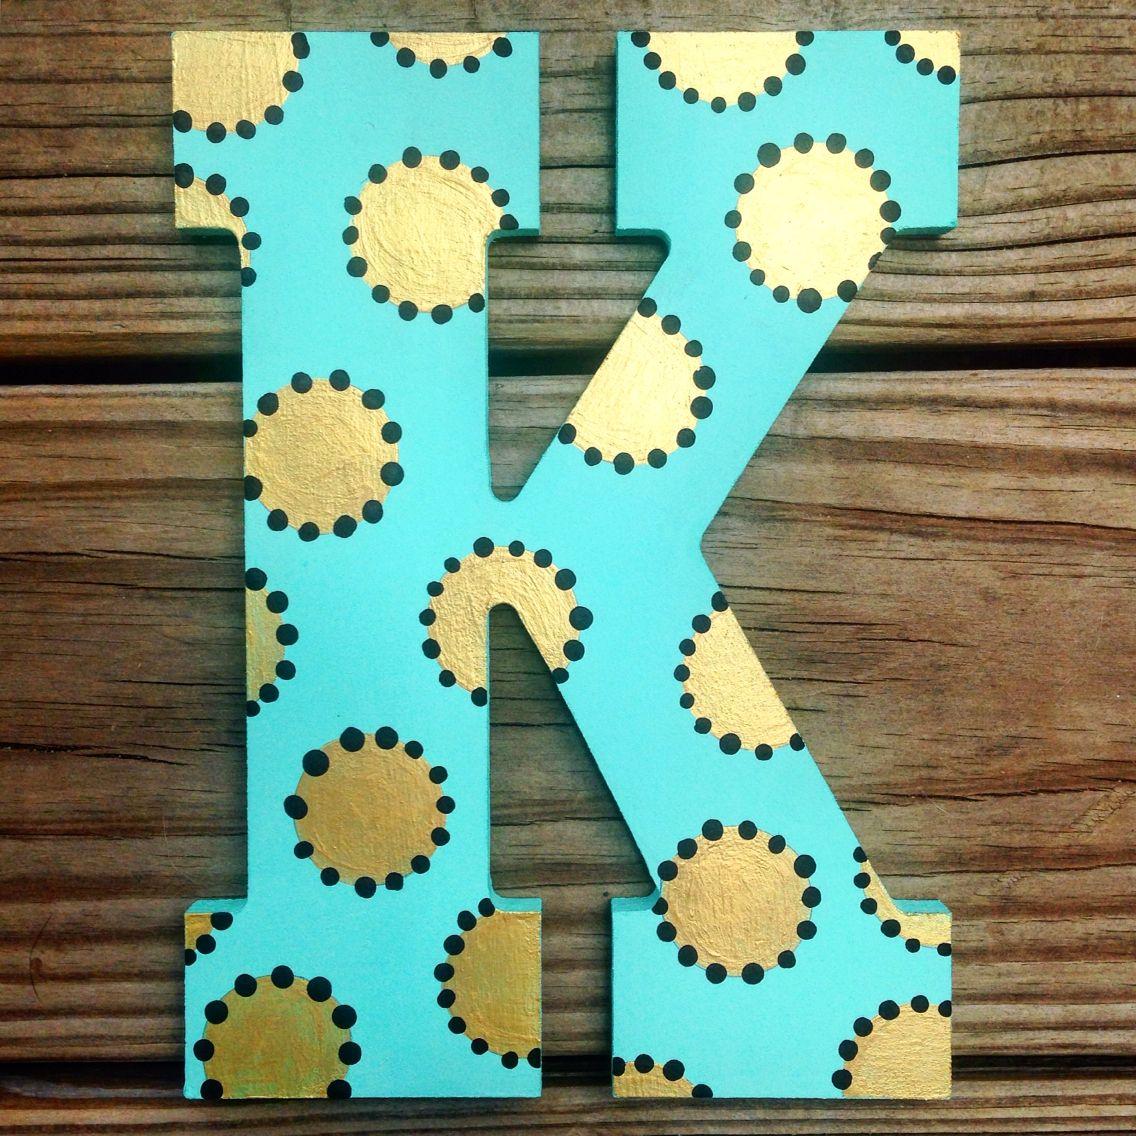 Boho Dots Letter K Check Out Kindasouthern Etsy Com Wooden